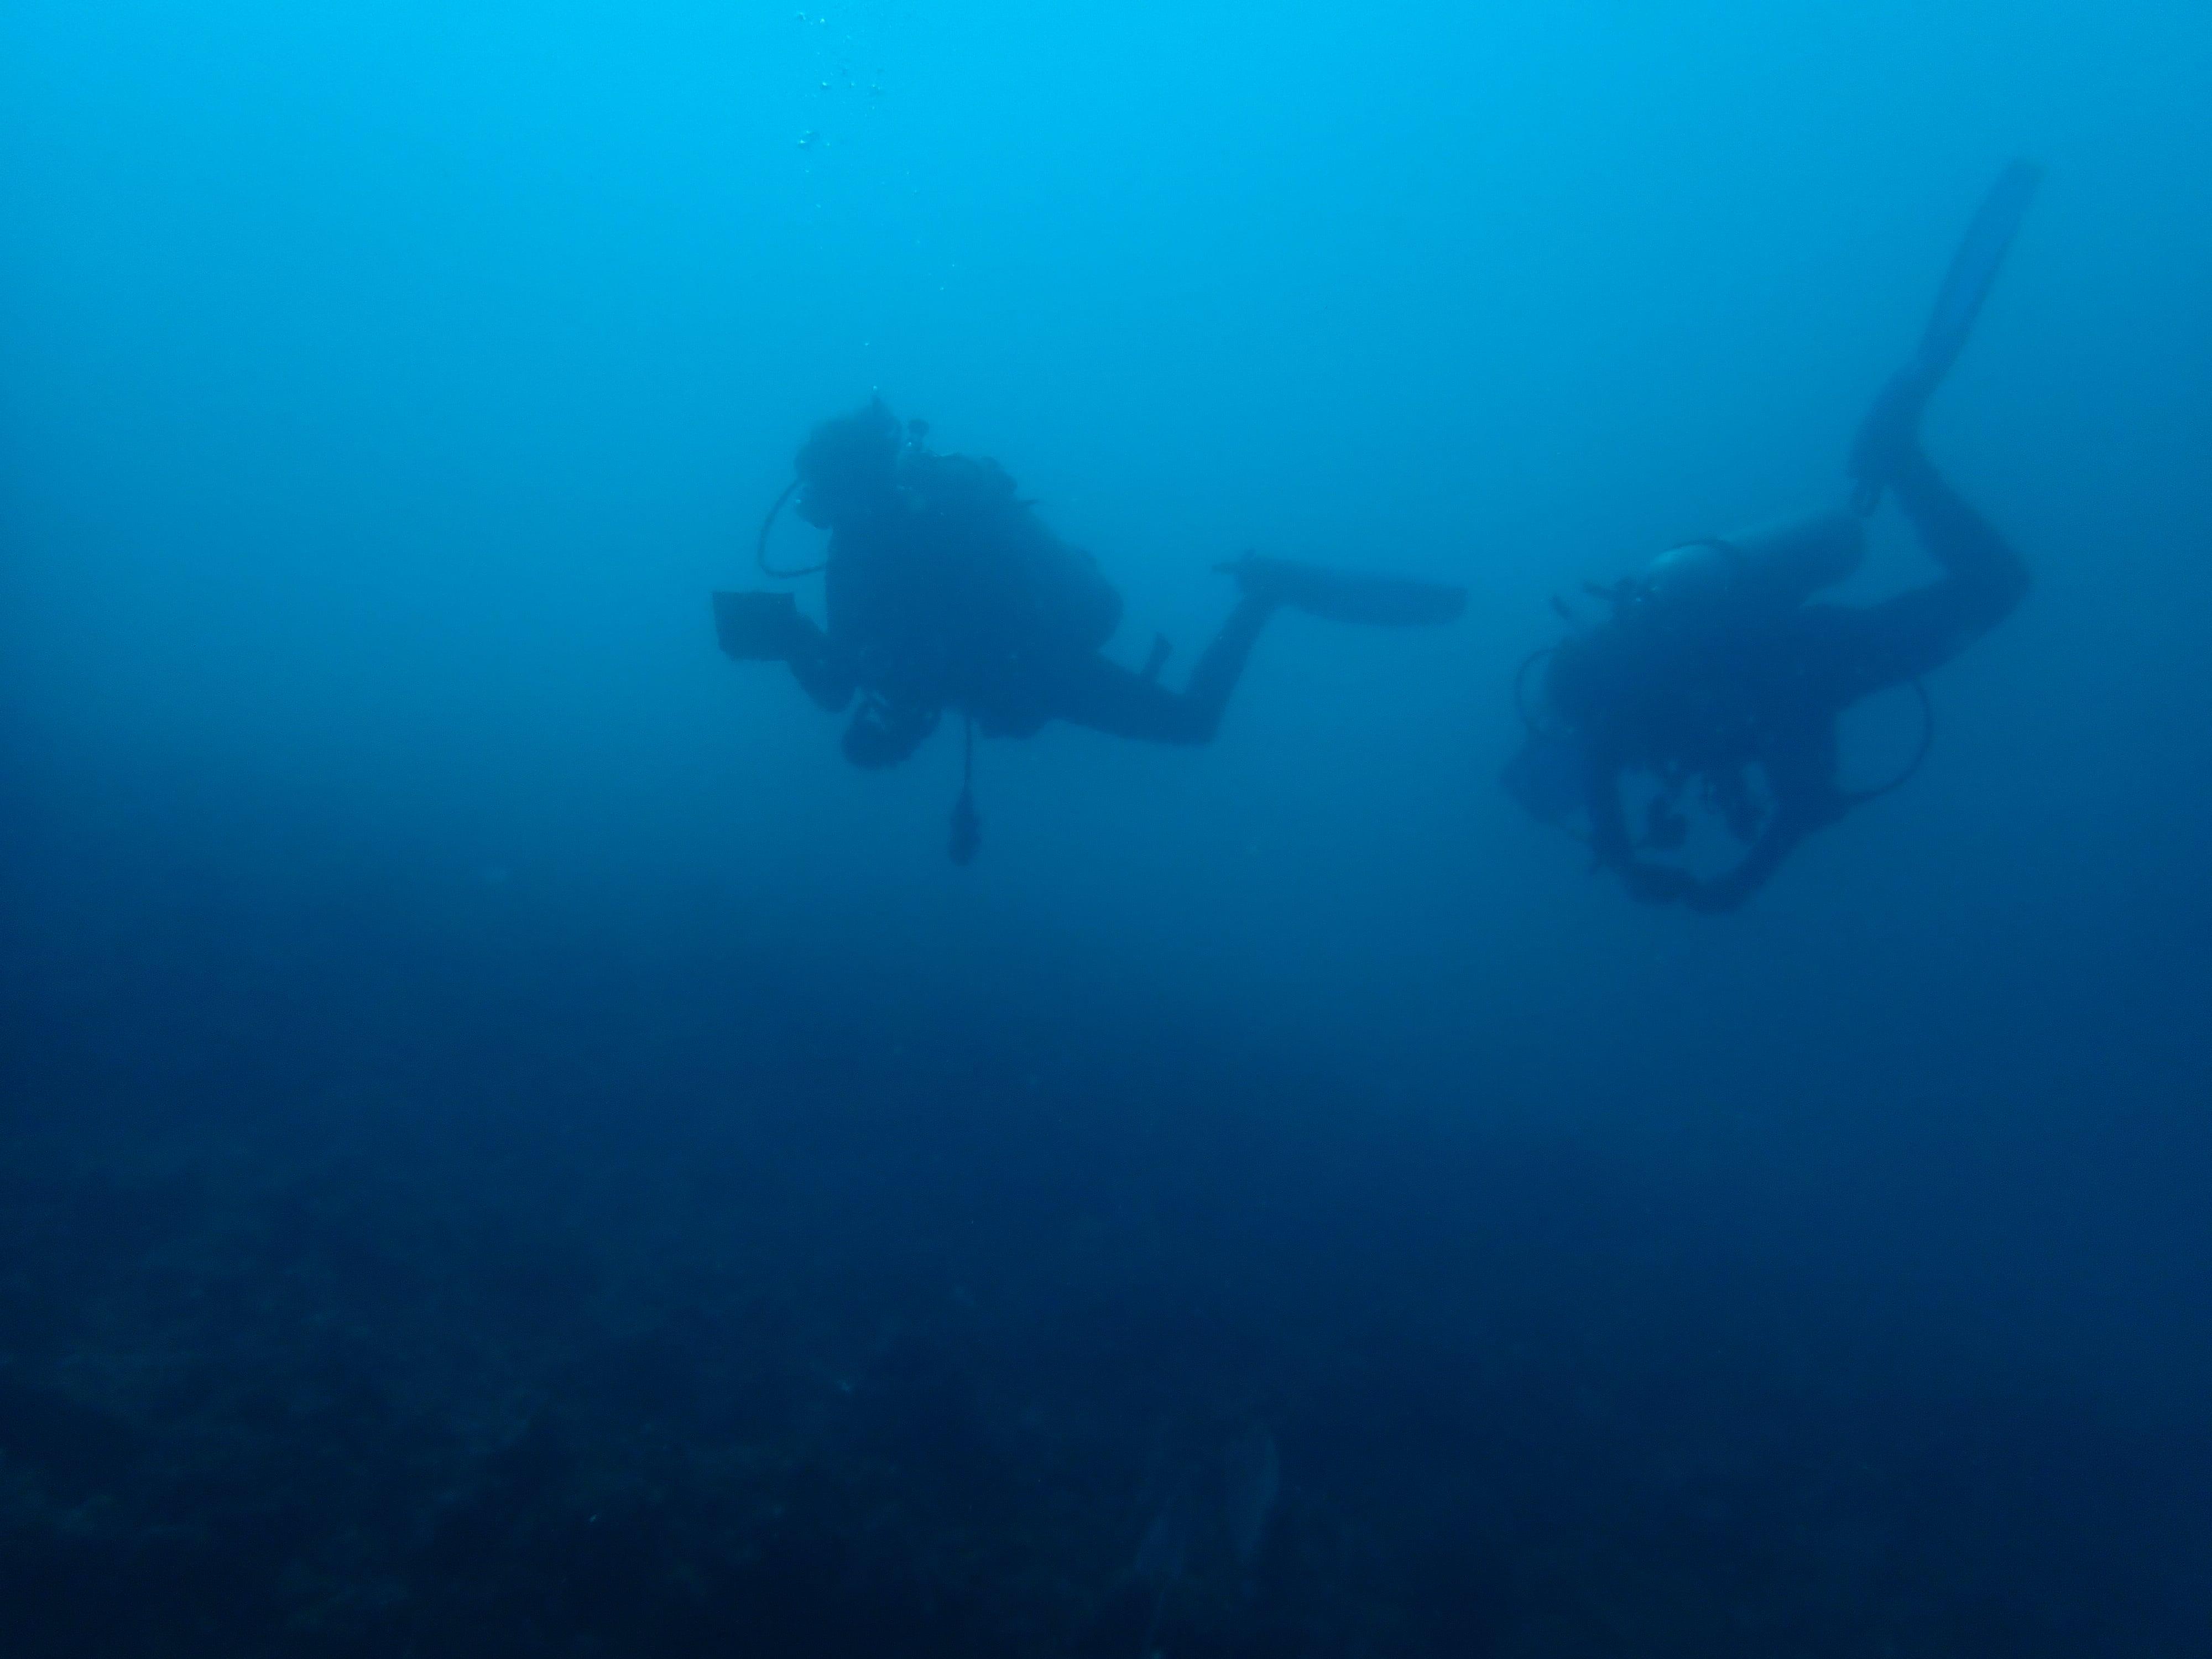 Relax underwater – no frustration